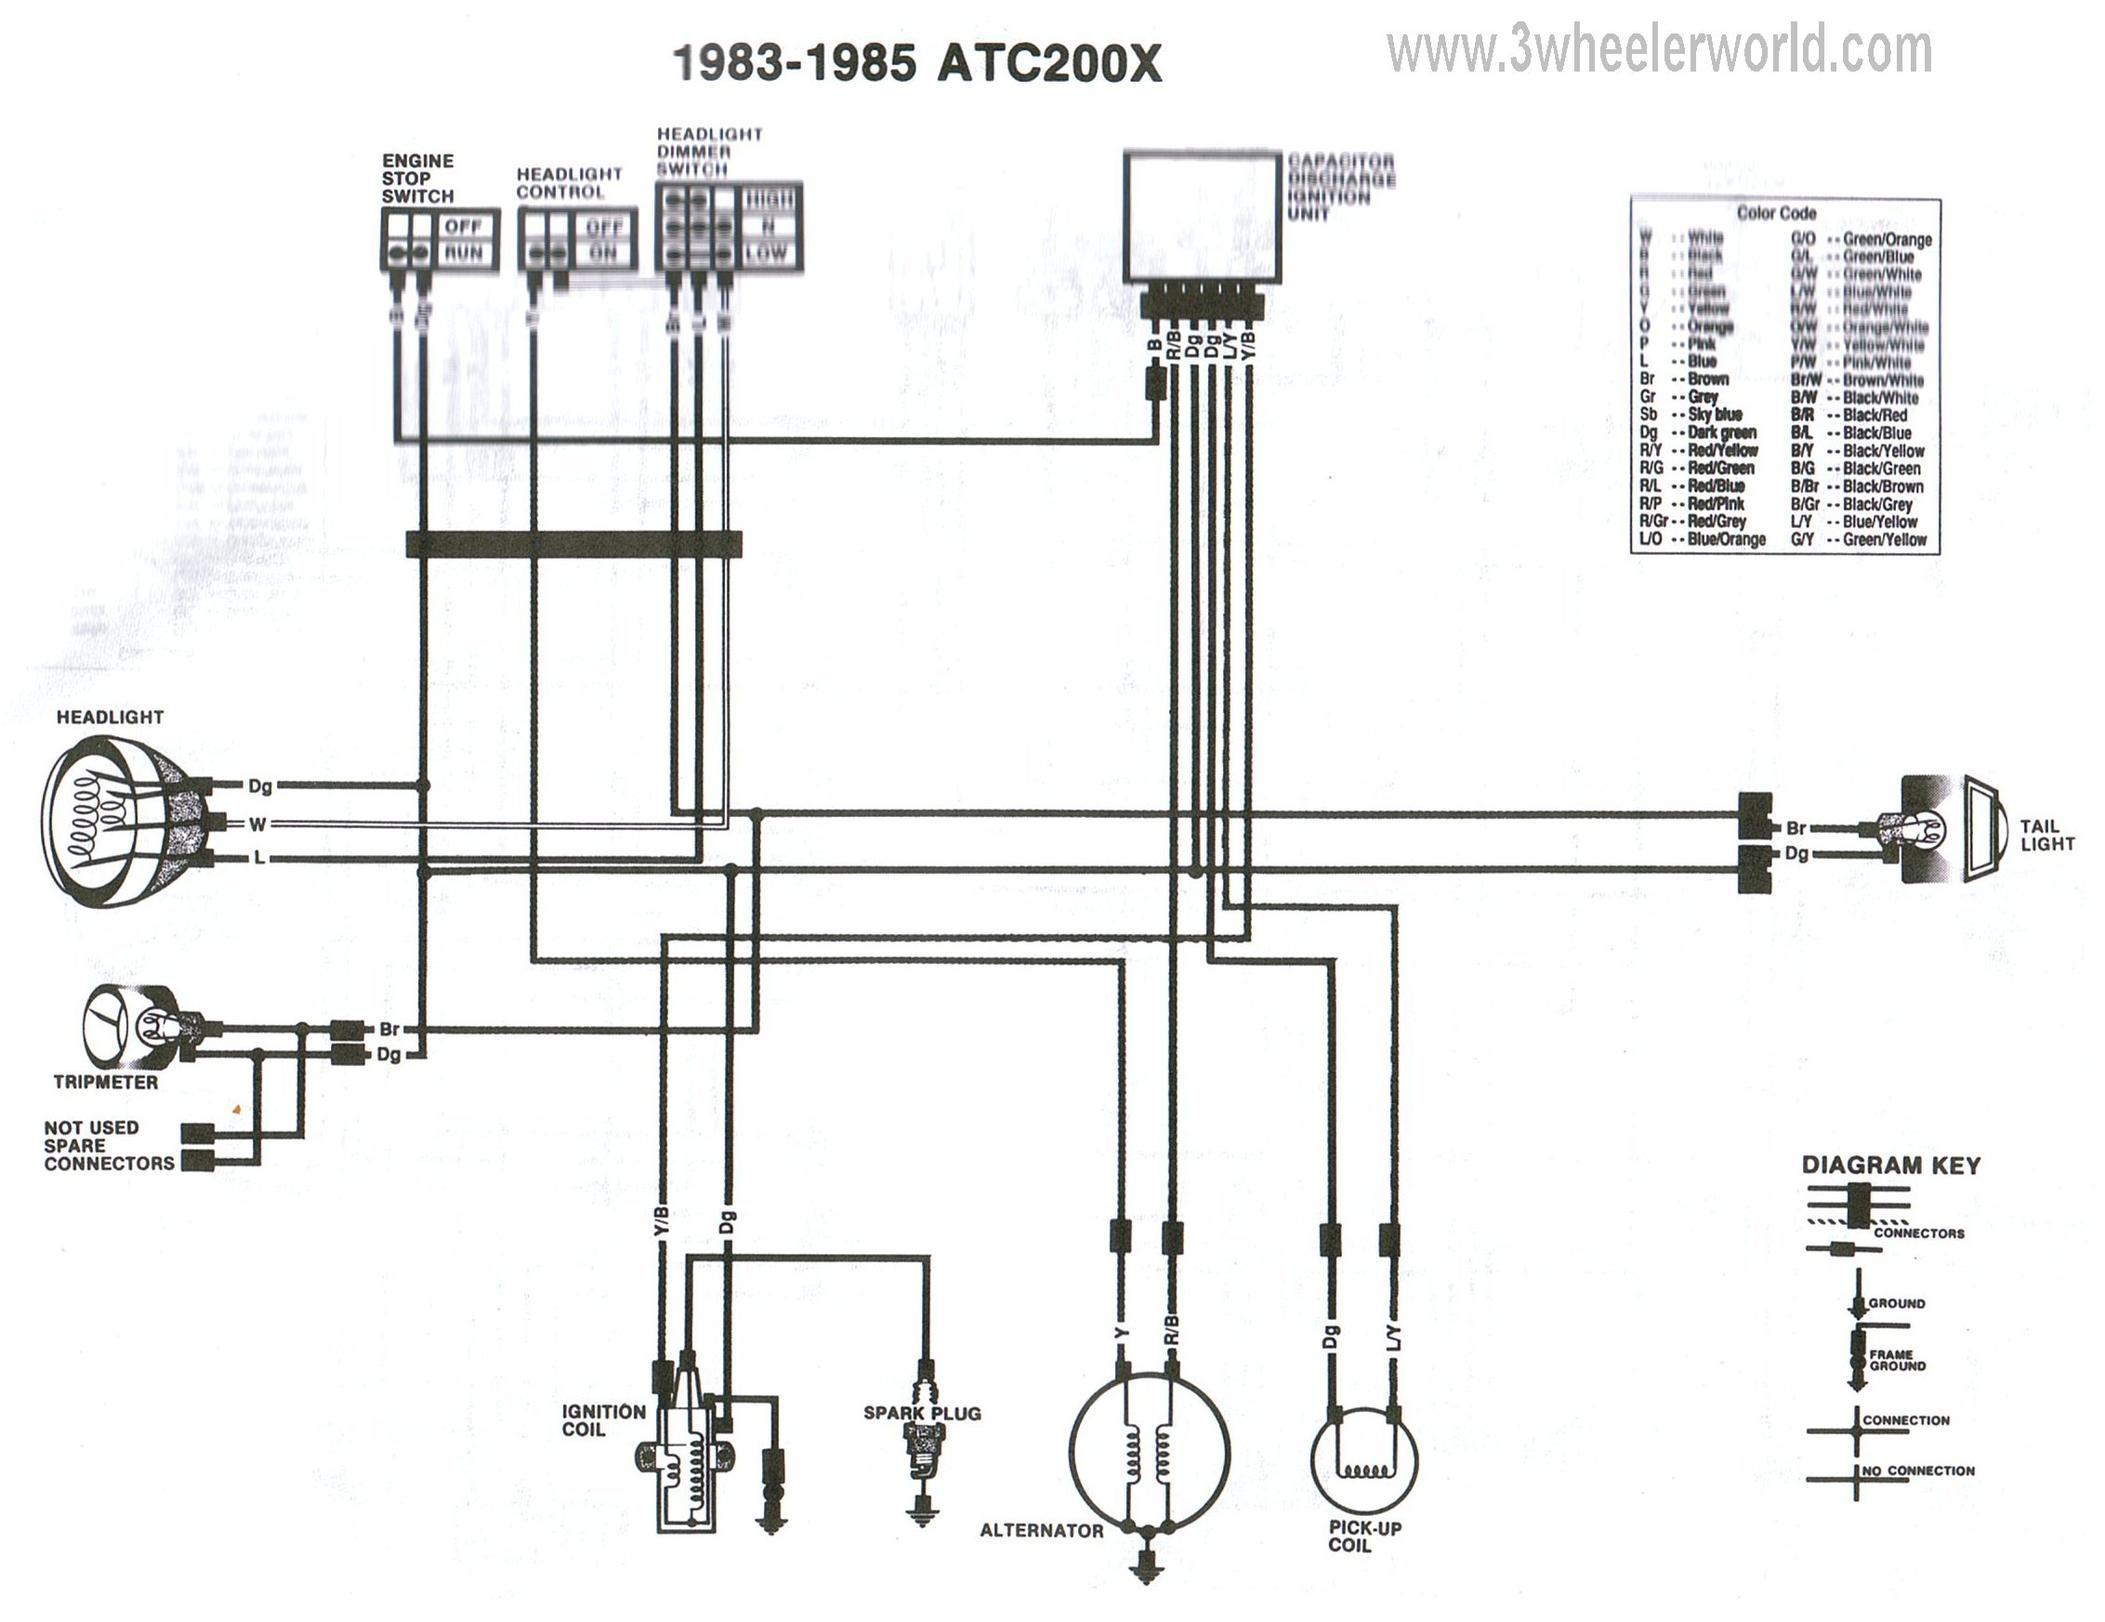 Mesmerizing Honda Cb200 Wiring Diagram Images - Best Image Wiring ...